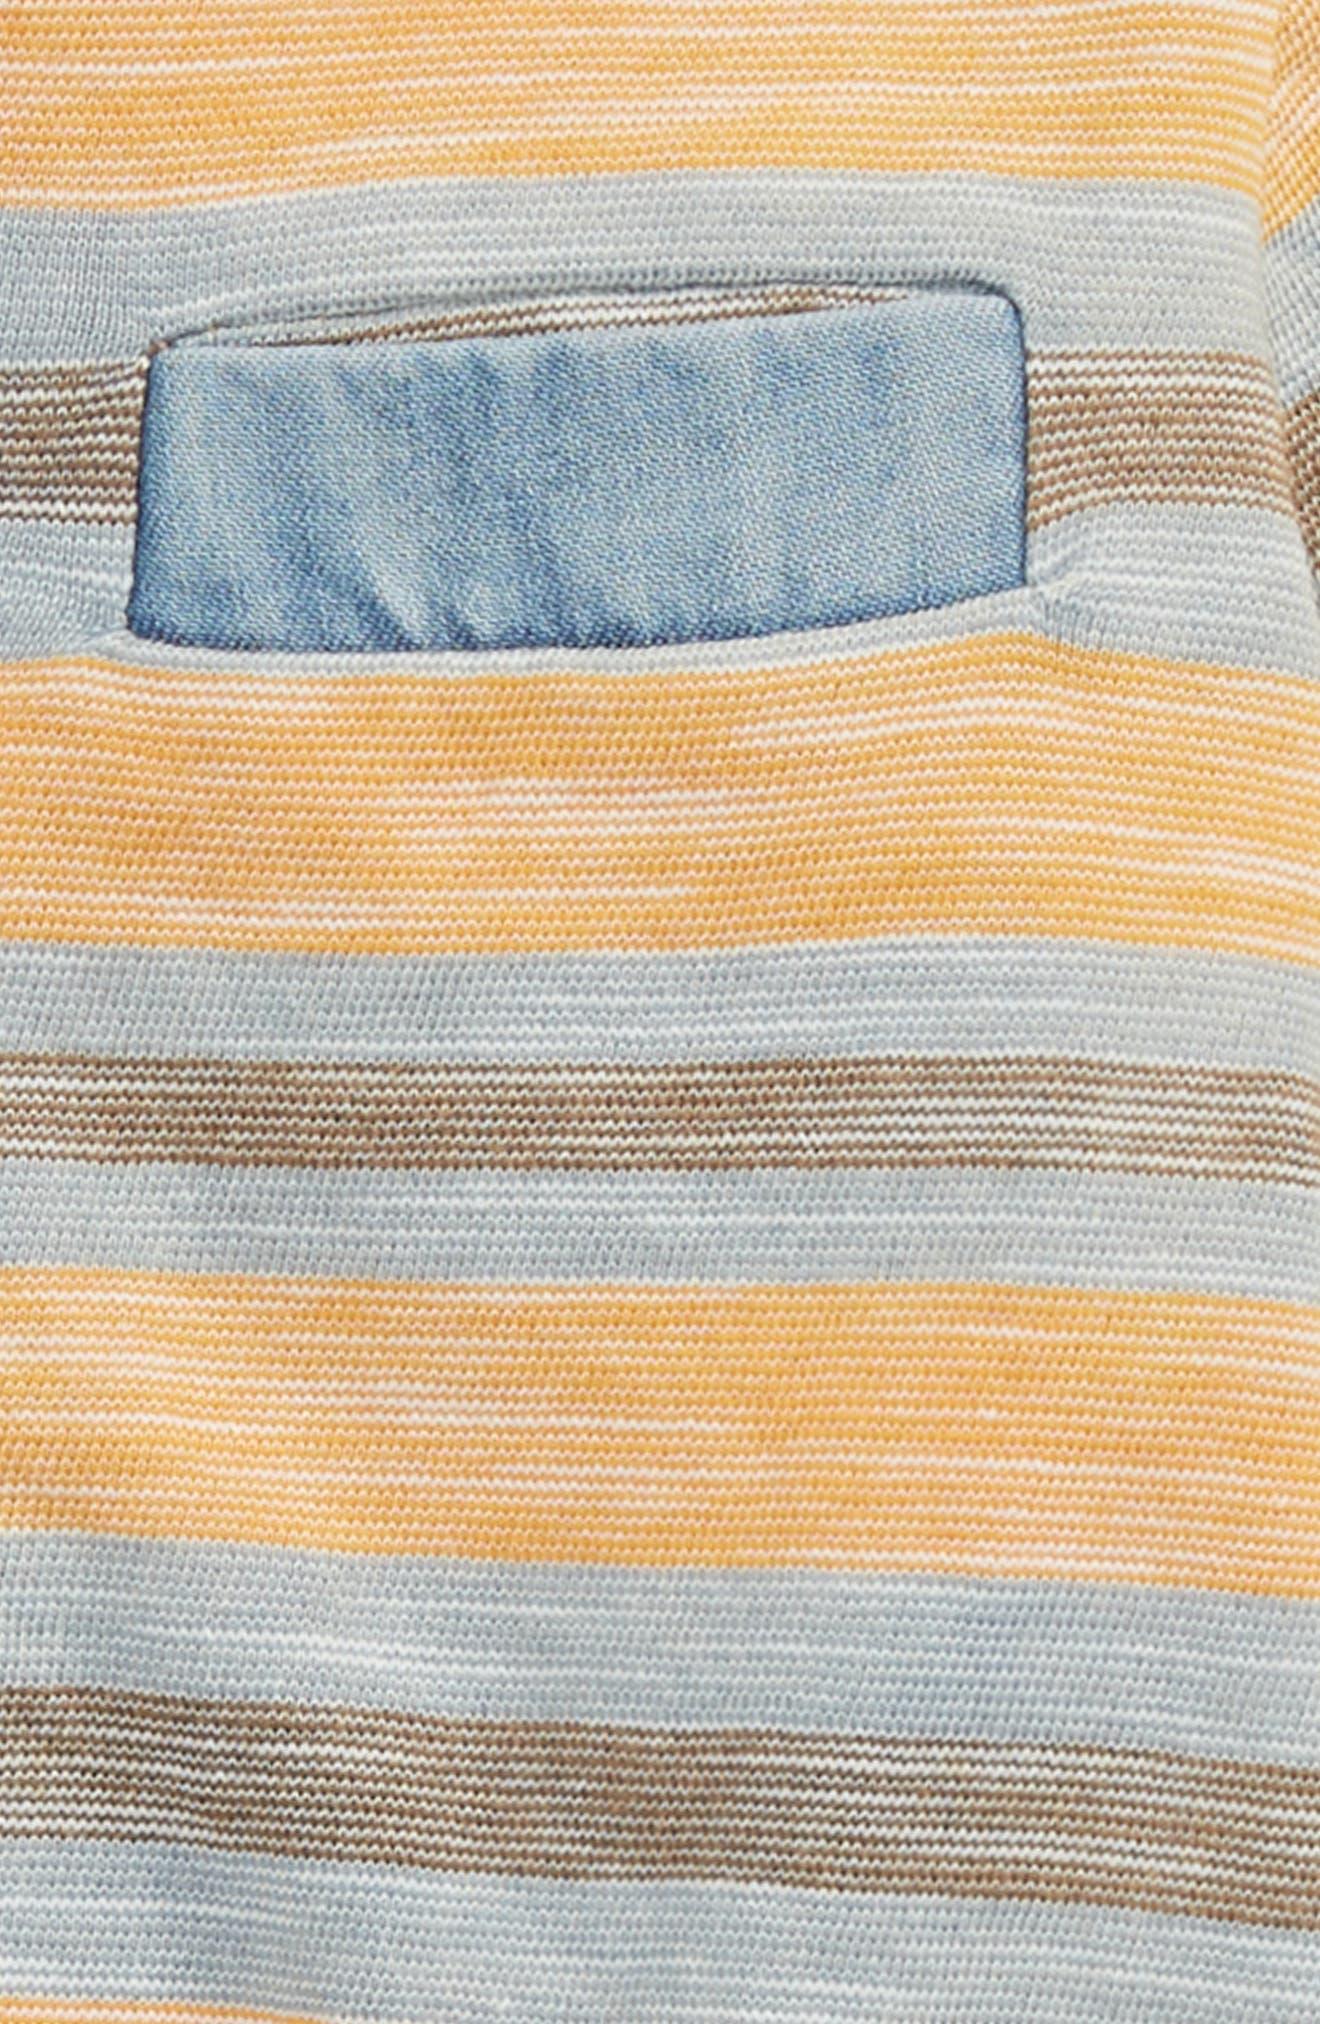 Reverse Stripe Henley,                             Alternate thumbnail 2, color,                             Orange Glaze- Blue Stripe